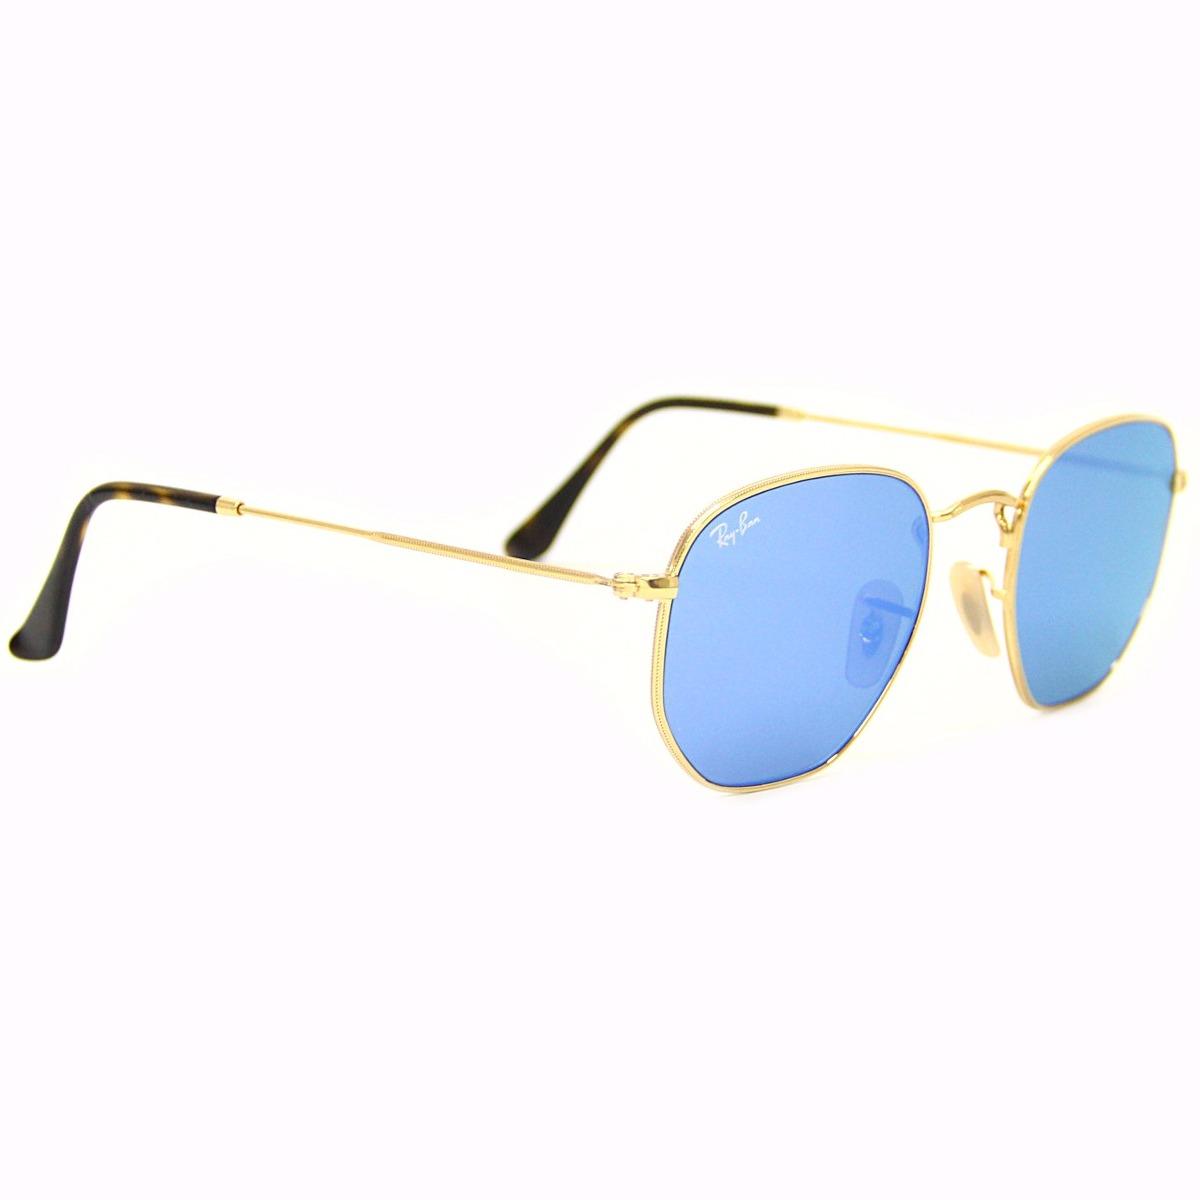 56e42dd69043c óculos sol ray ban 3548 hexa original + limpa lentes. Carregando zoom.